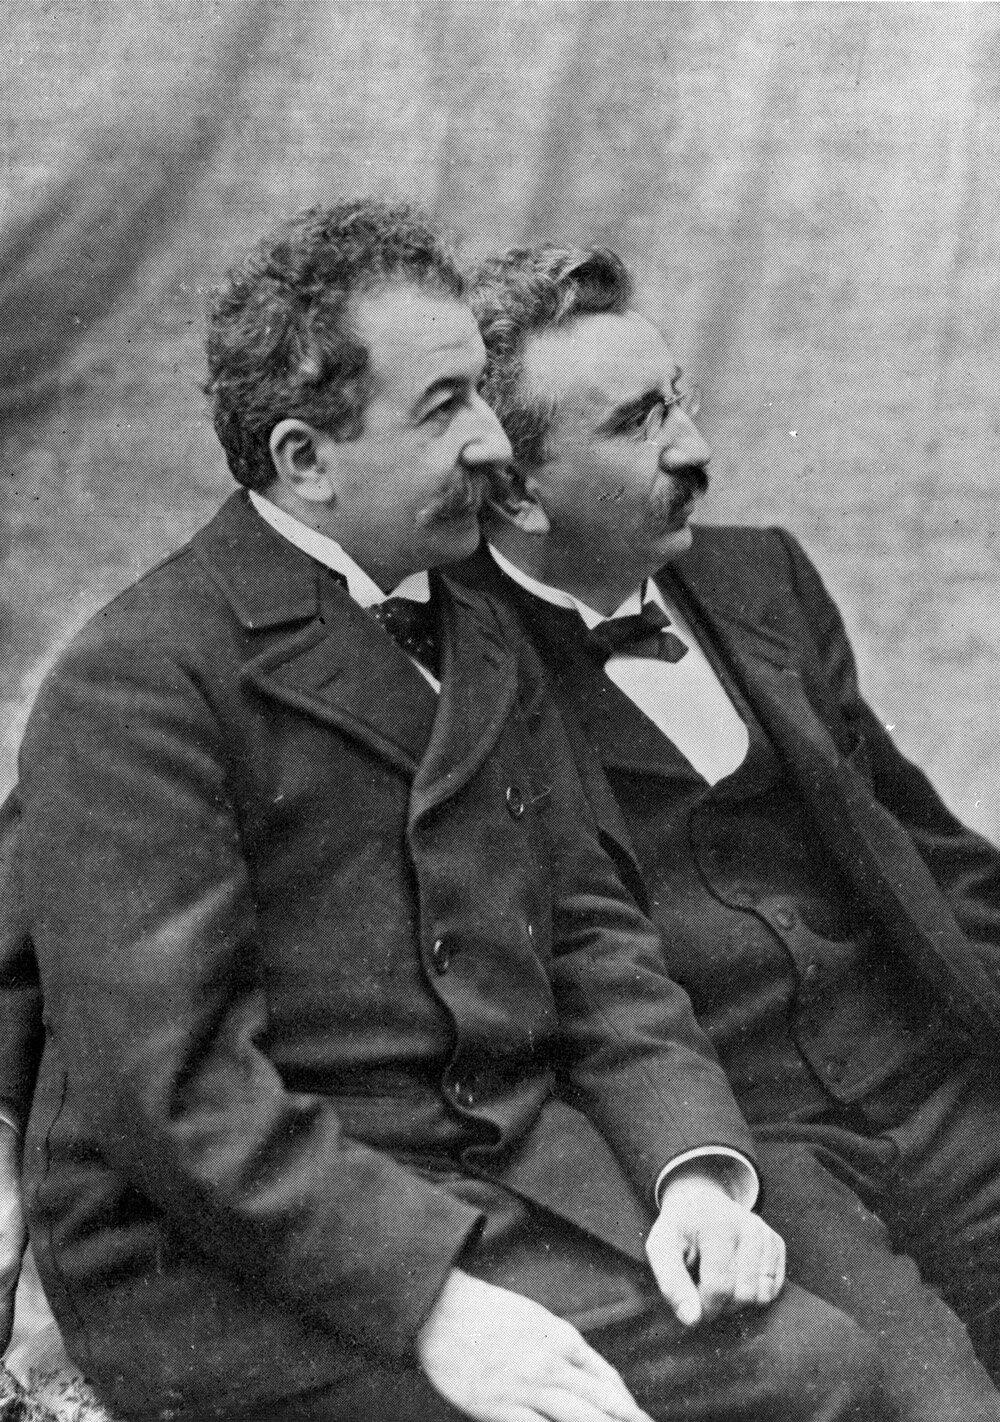 Lumiere-brothers-portrait.jpg